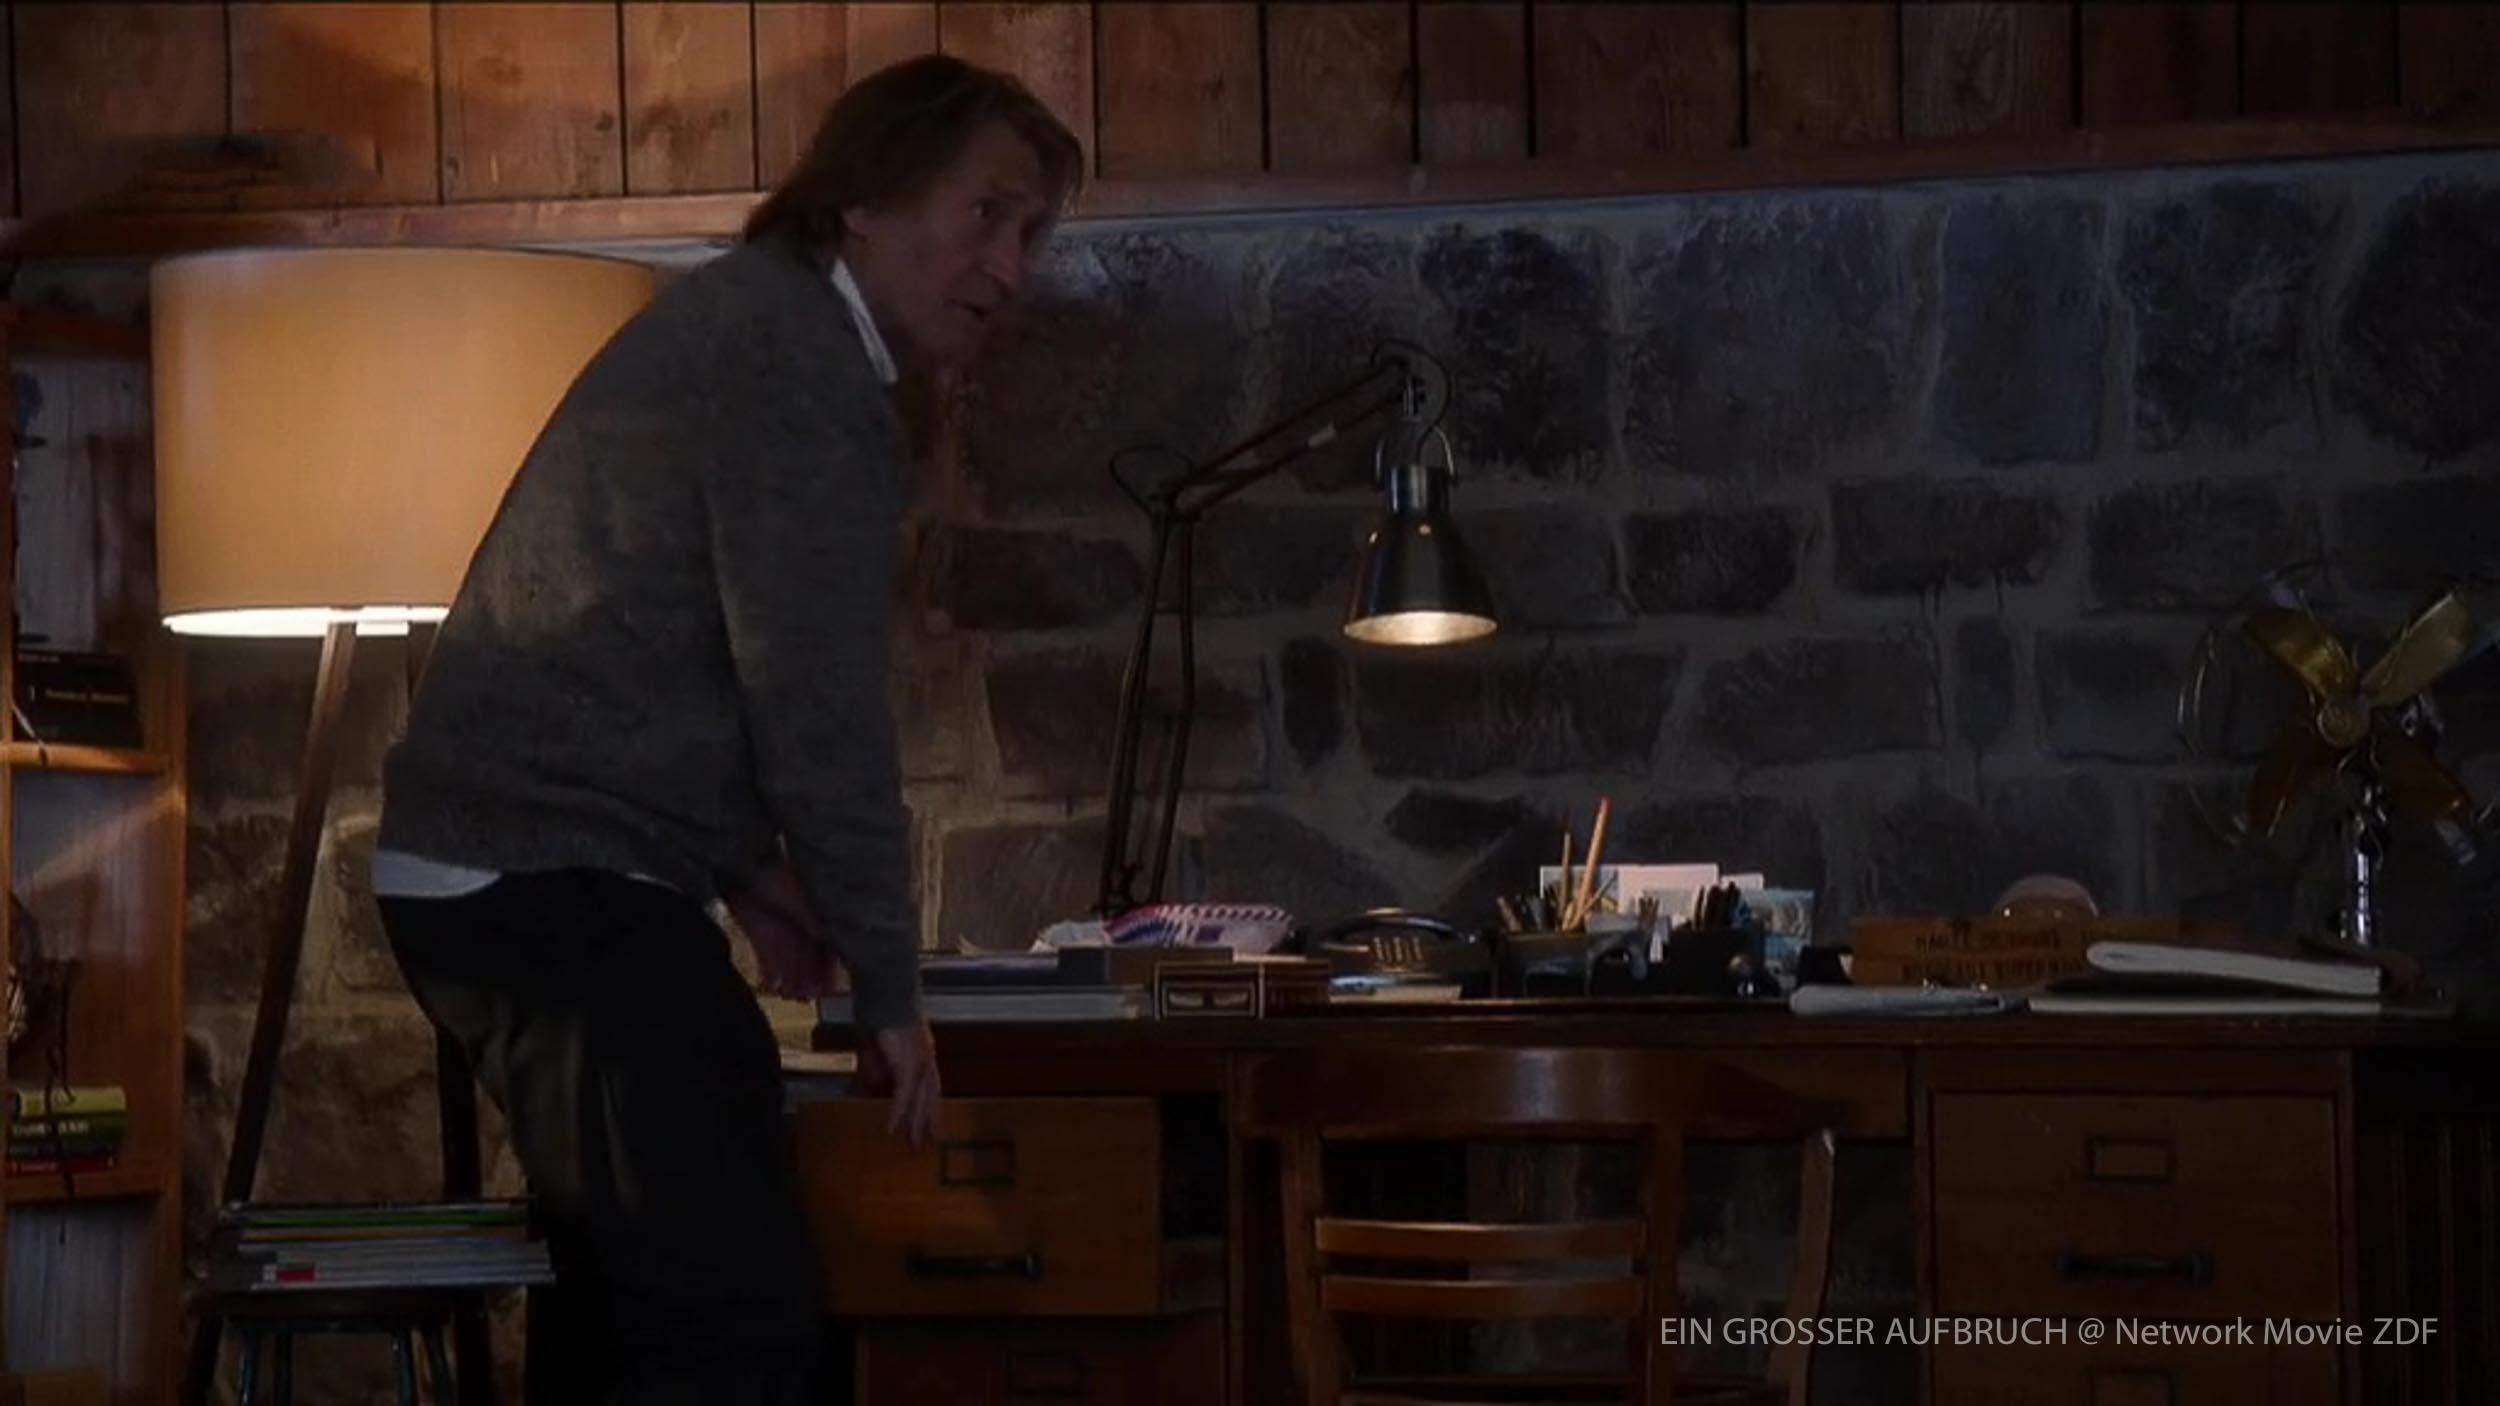 EIN GROSSER AUFBRUCH Regie Matti Geschonneck Szenenbild Thomas Freudenthal-25.jpg